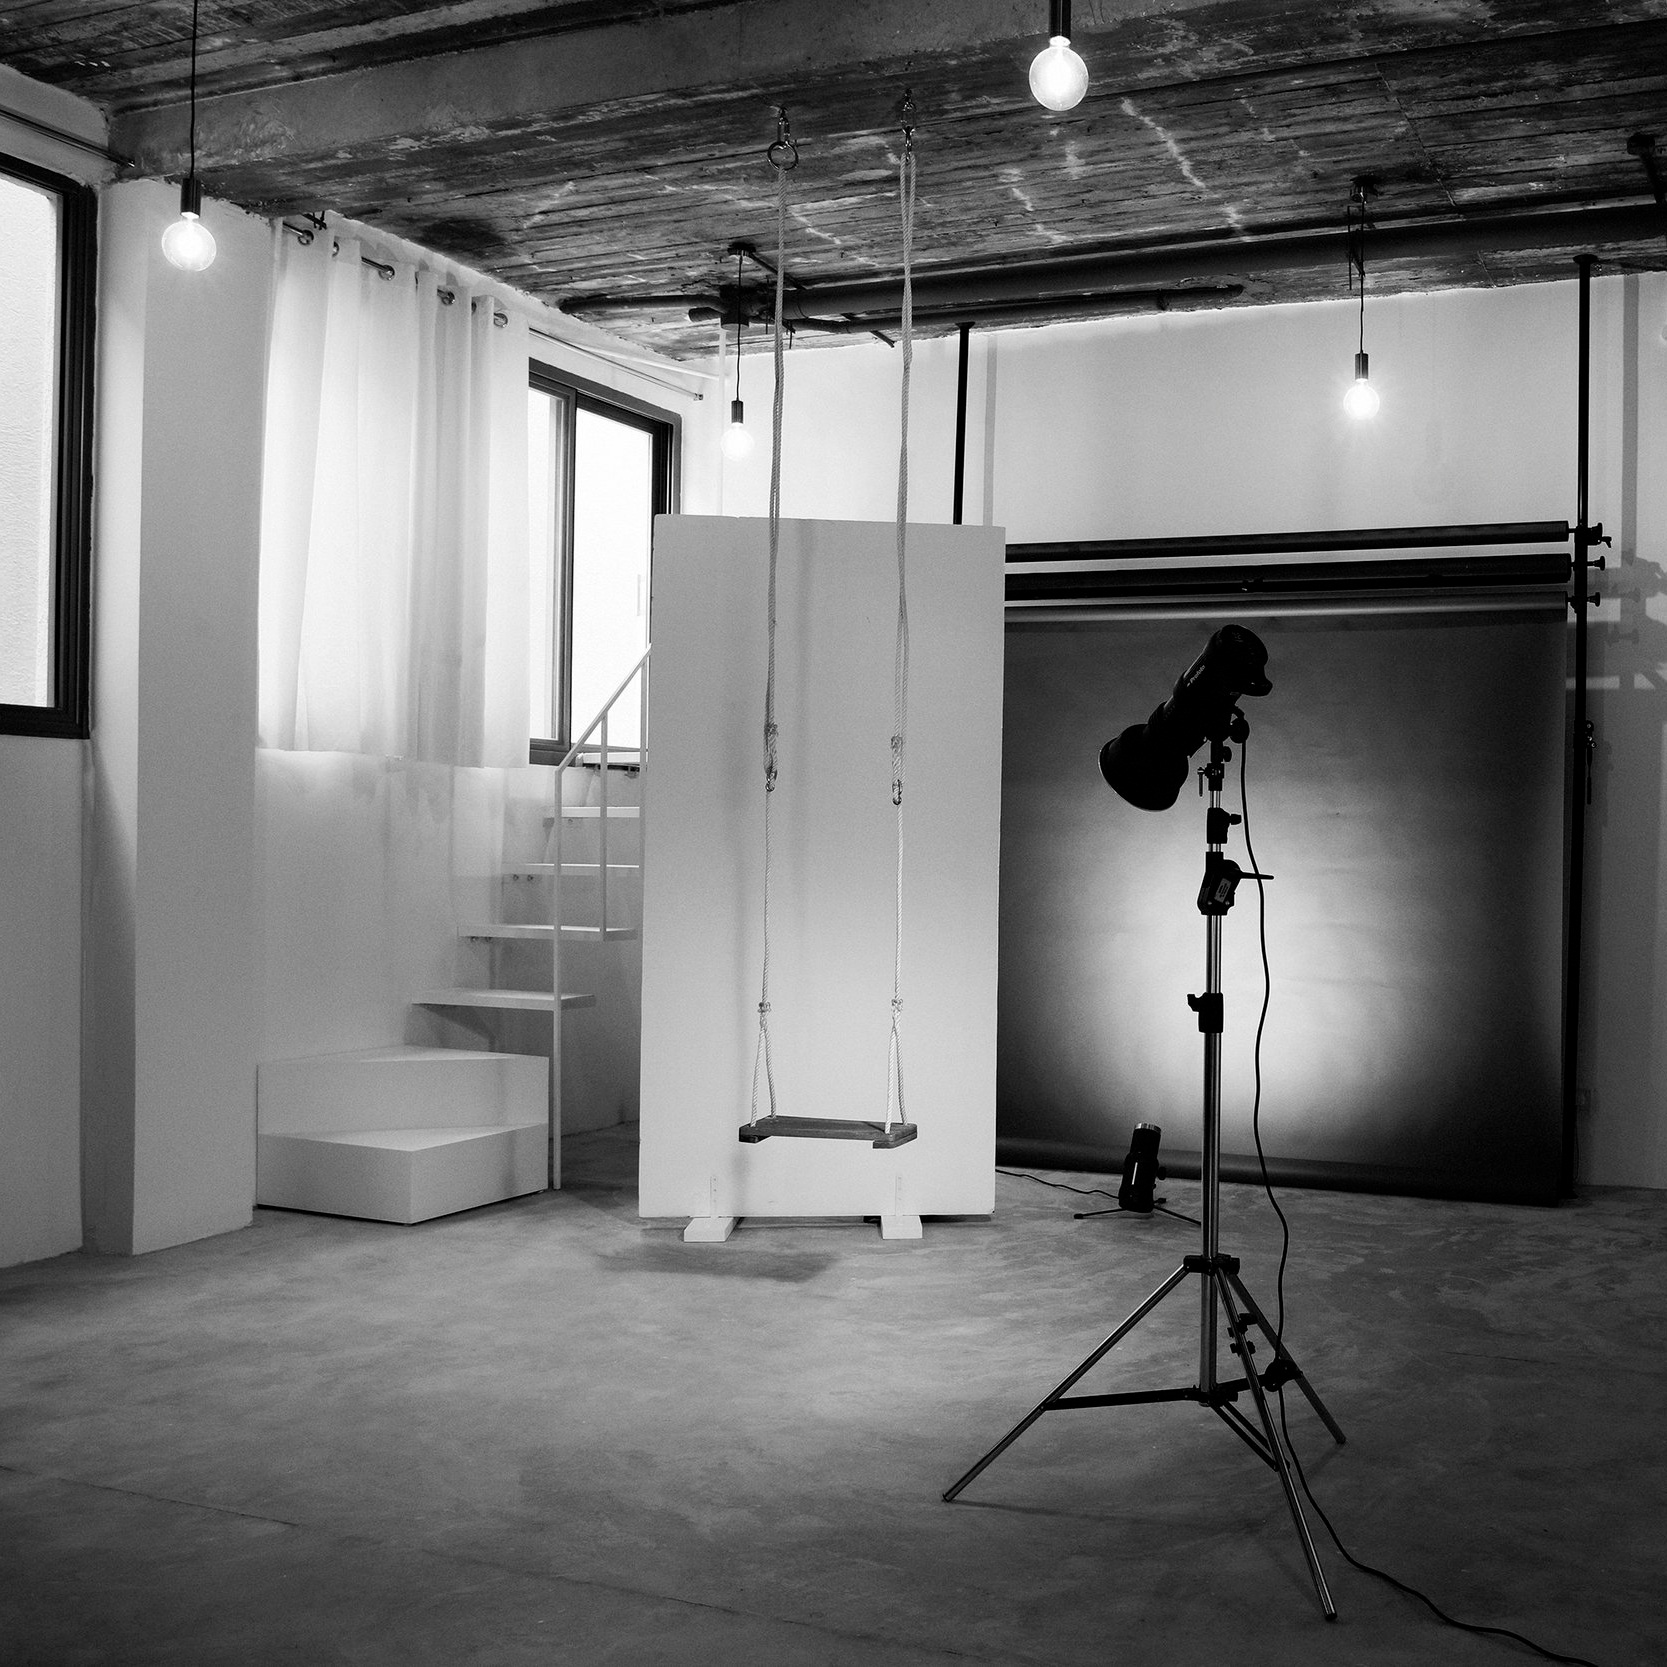 Triangle_creative_photography_studio_for_rent_kuwait